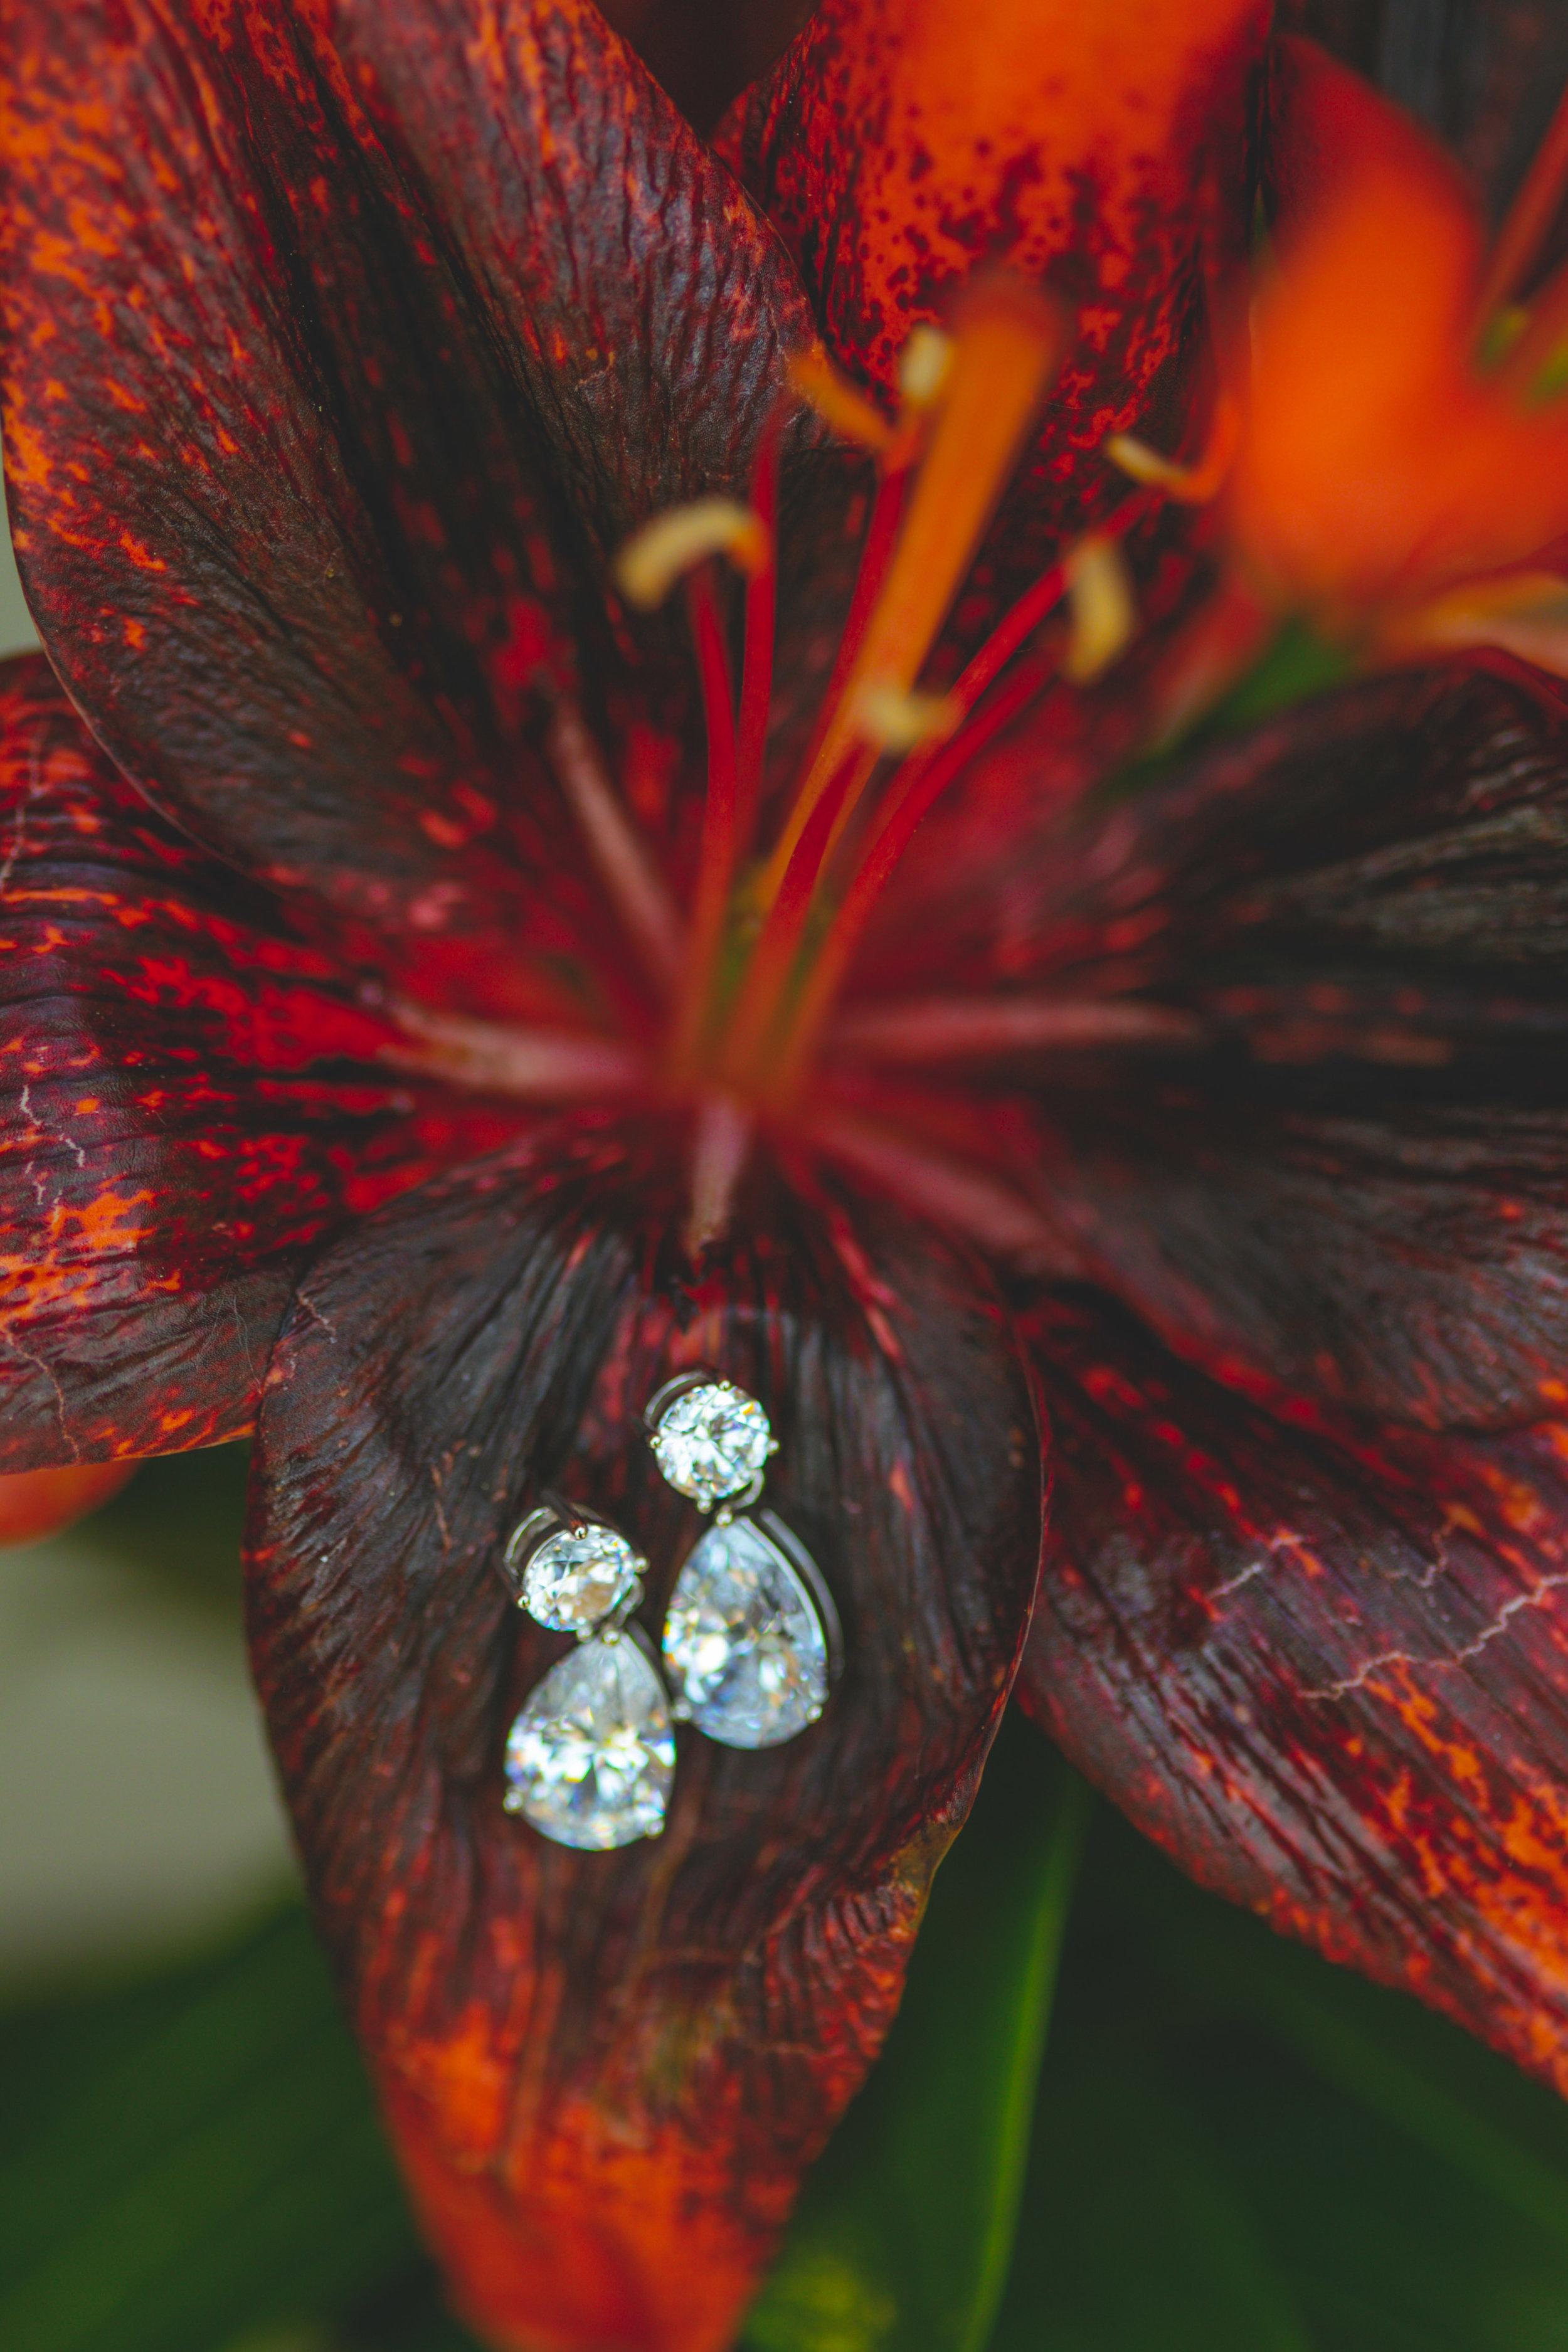 silver-lake-orland-park-wedding1.jpg